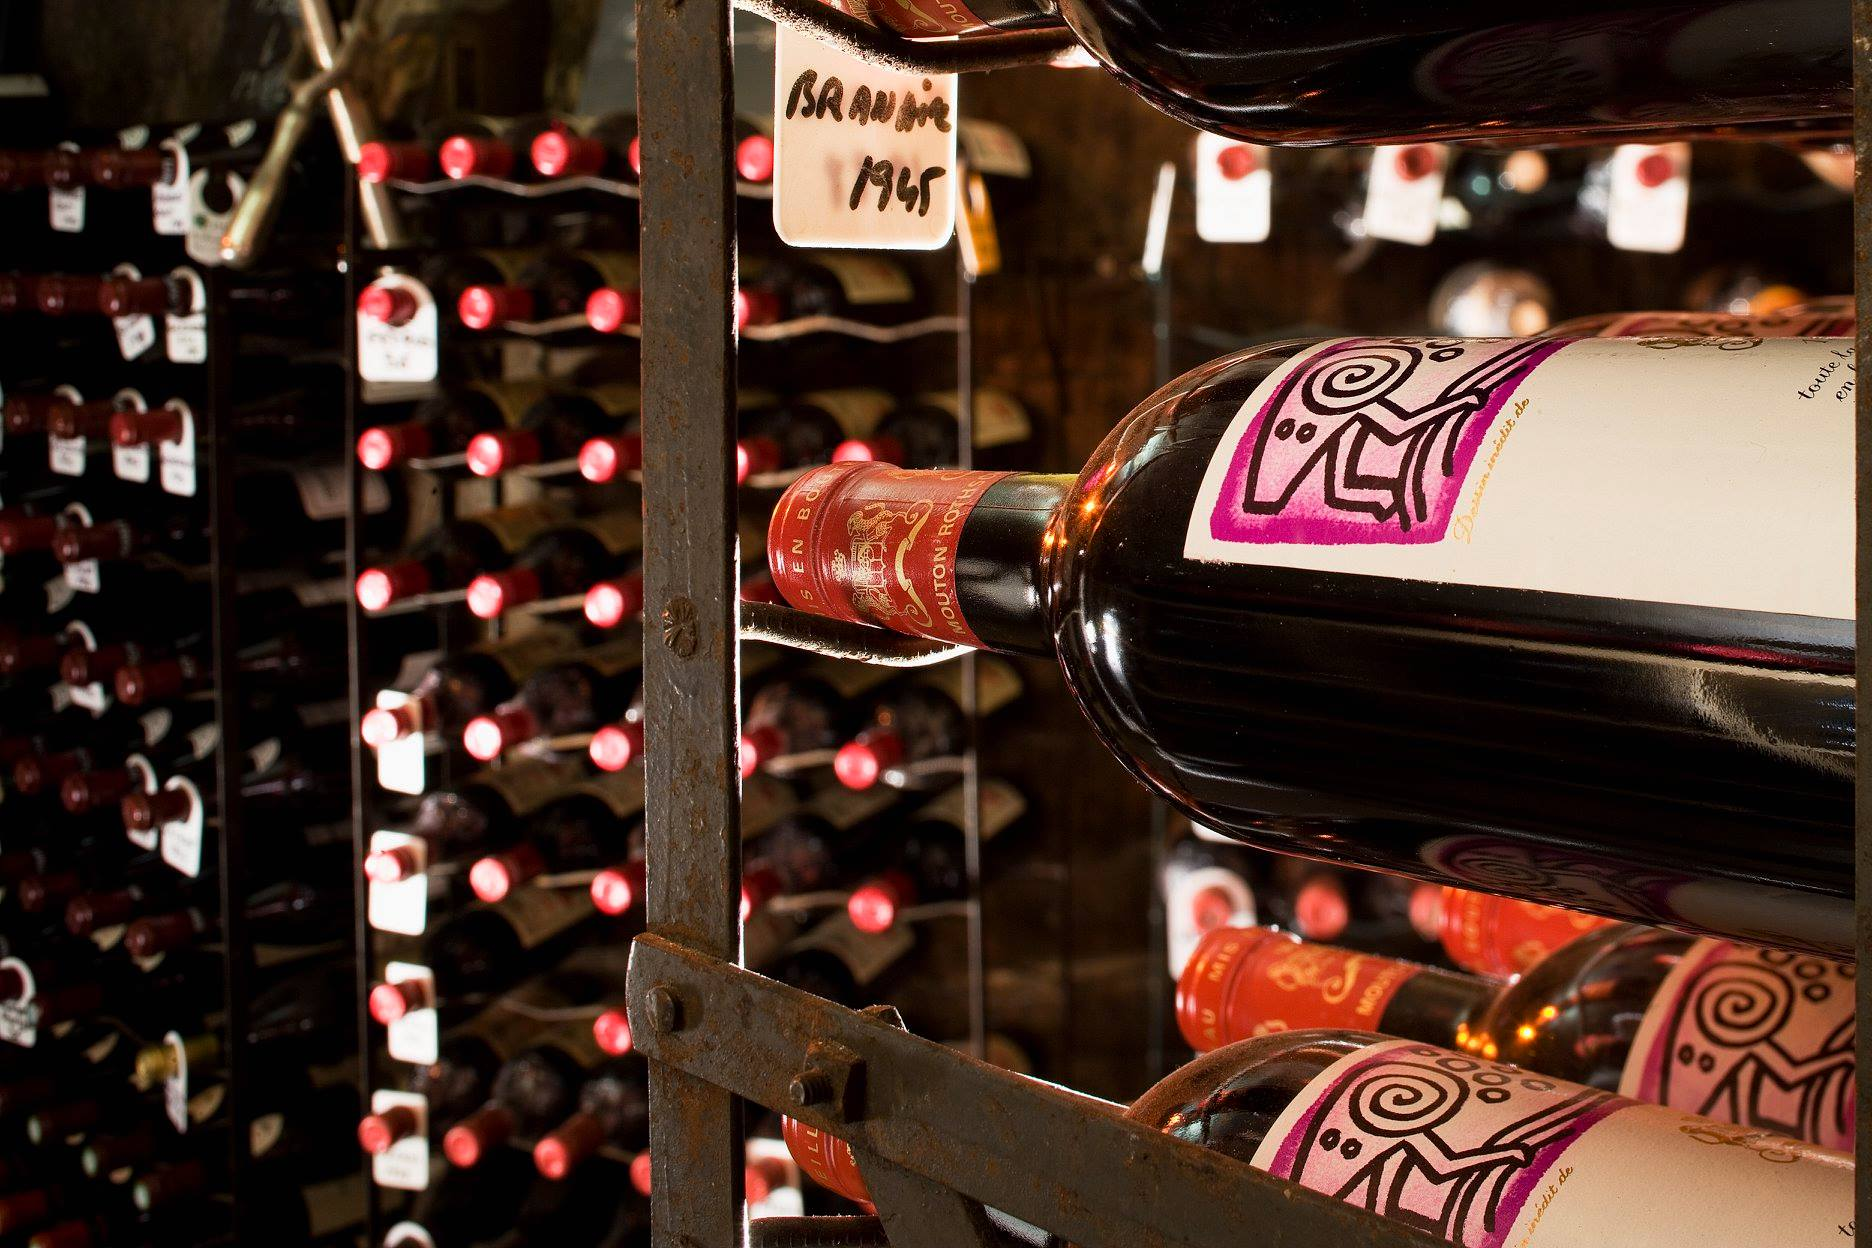 В Париже из элитного ресторана похитили вино на €600 000